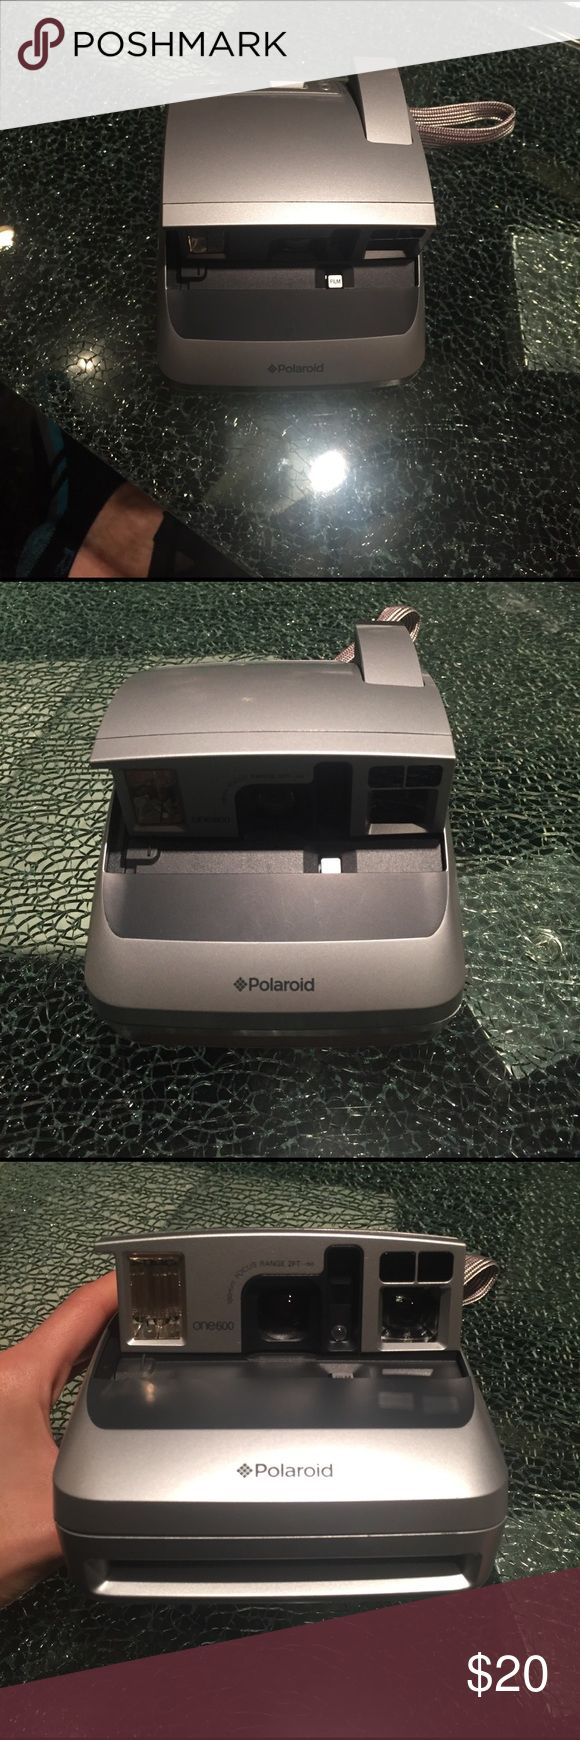 Polaroid Polaroid one 600.  100mm focus range 2 feet.  Works perfectly, needs film. Used a few times polaroid Other